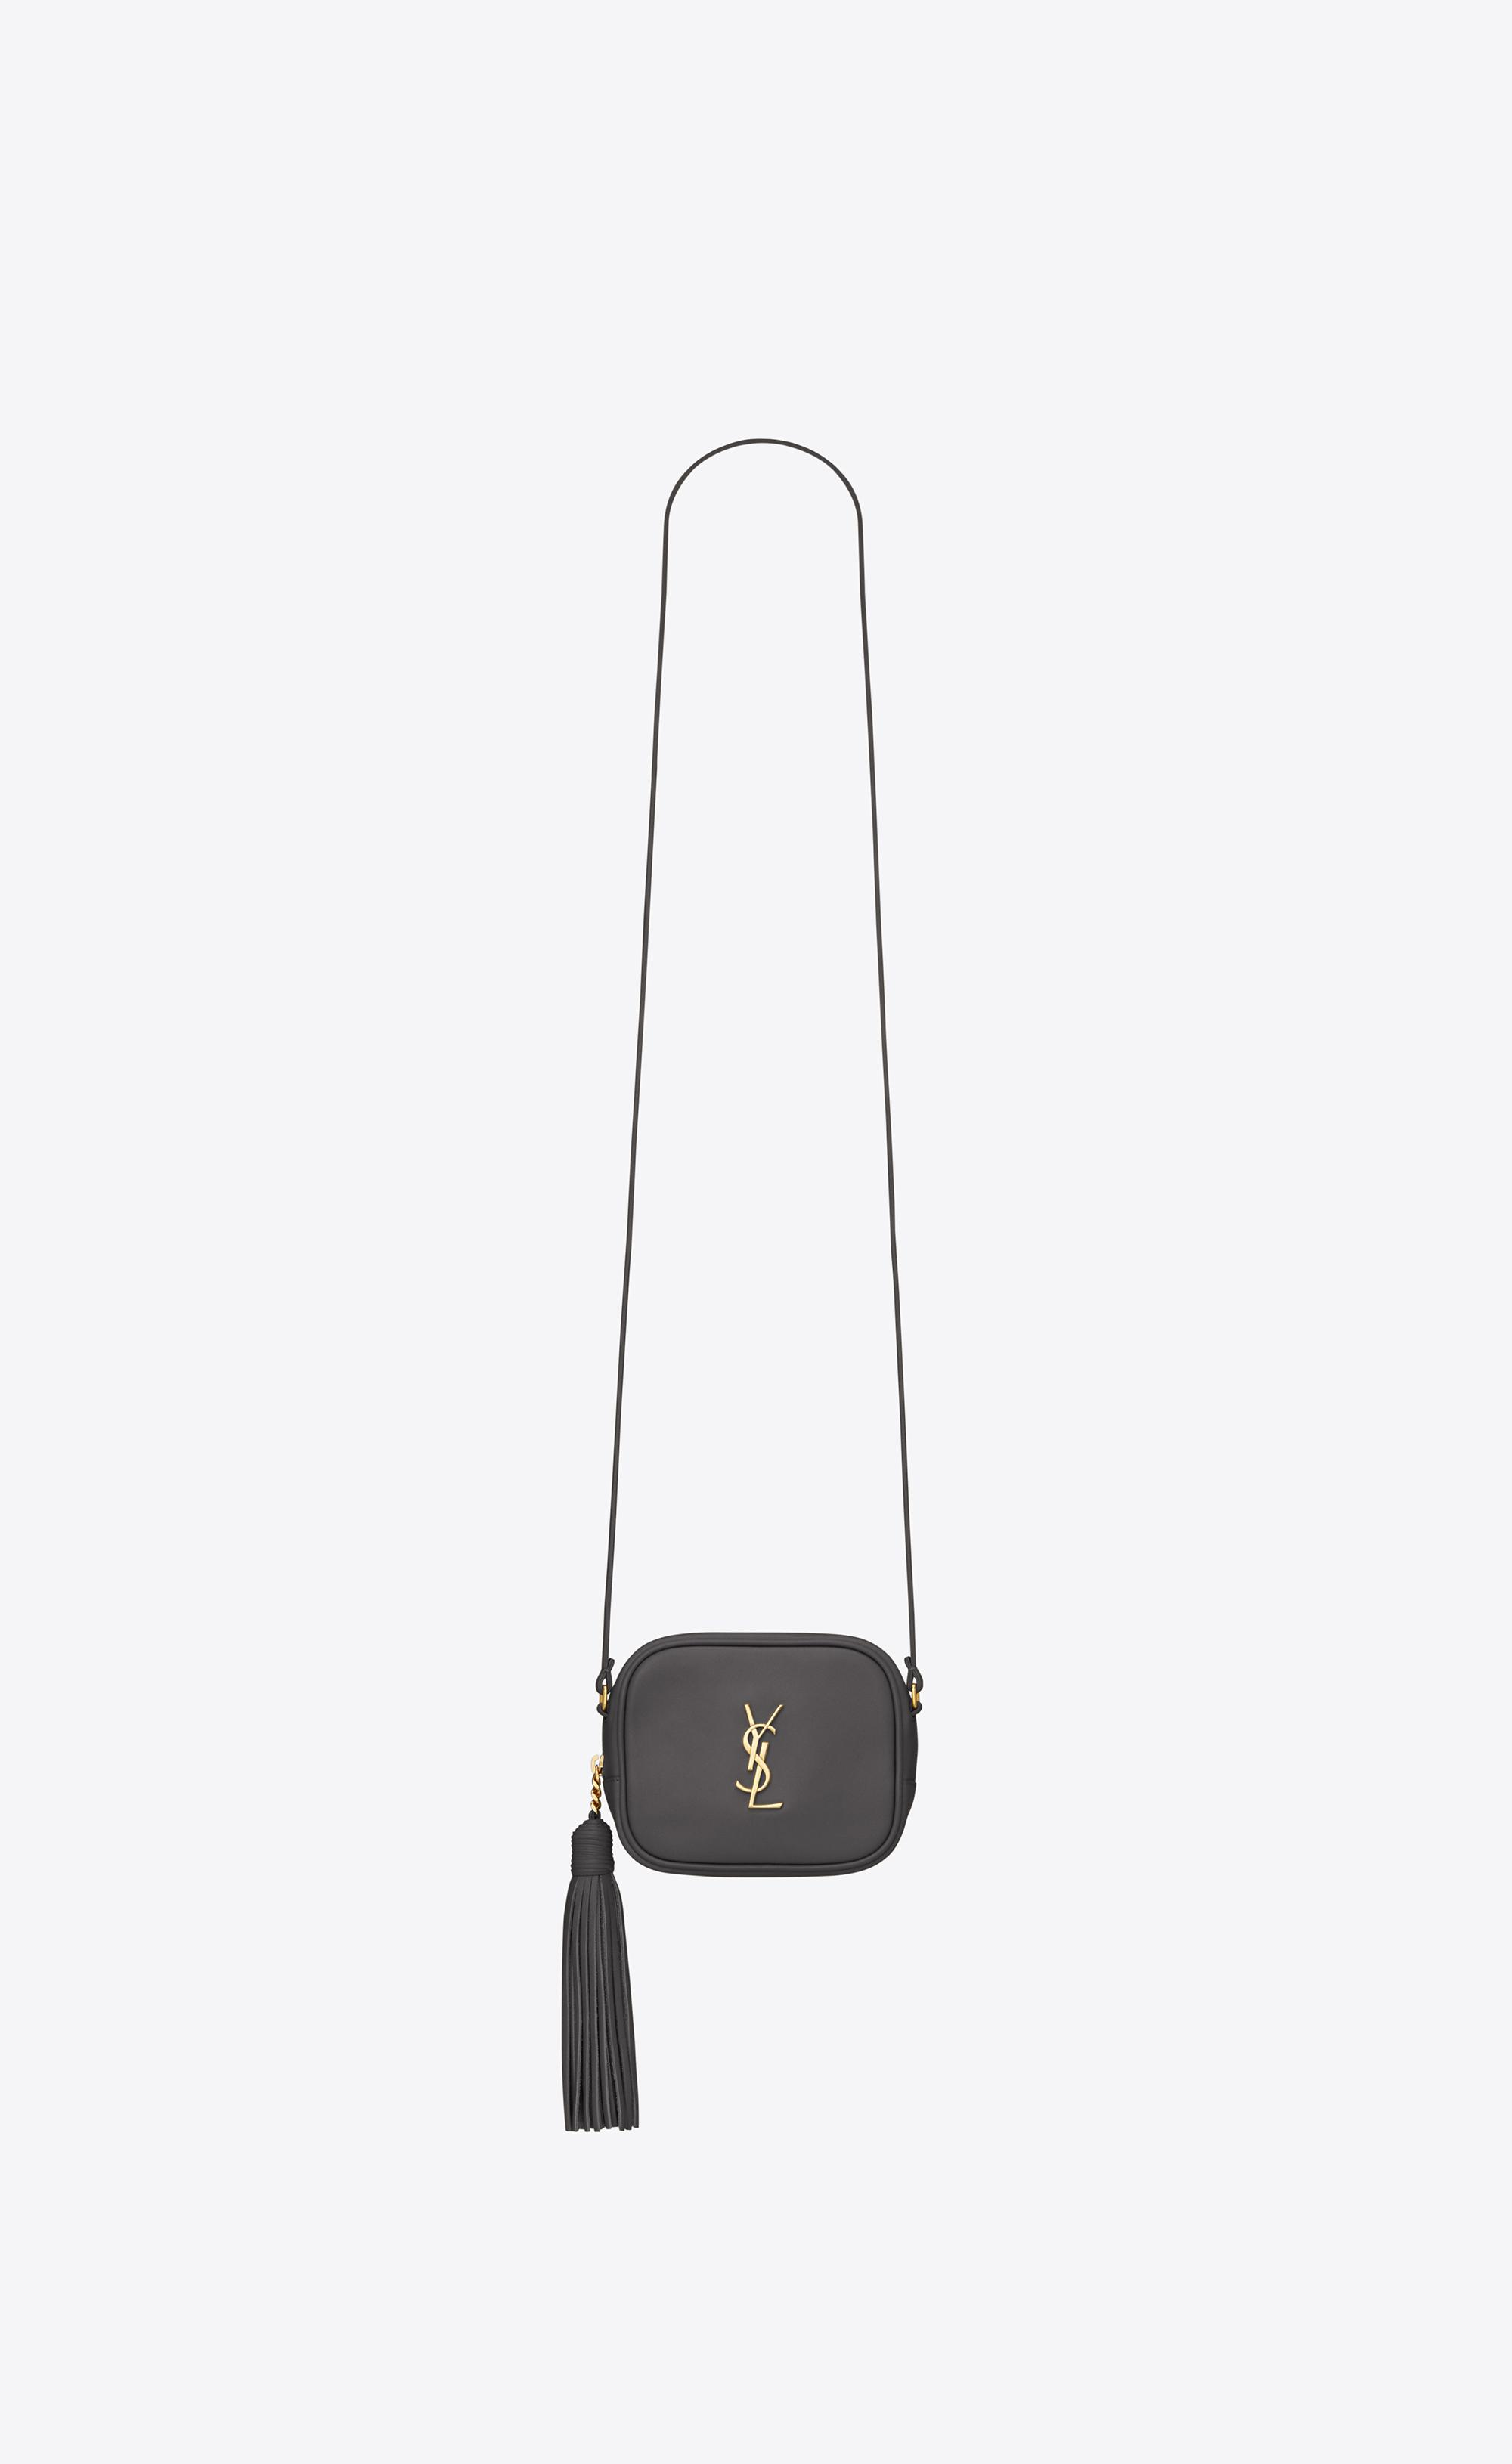 e7e73586bd18 Lyst - Saint Laurent Monogram Blogger Bag In Grey Leather in Gray